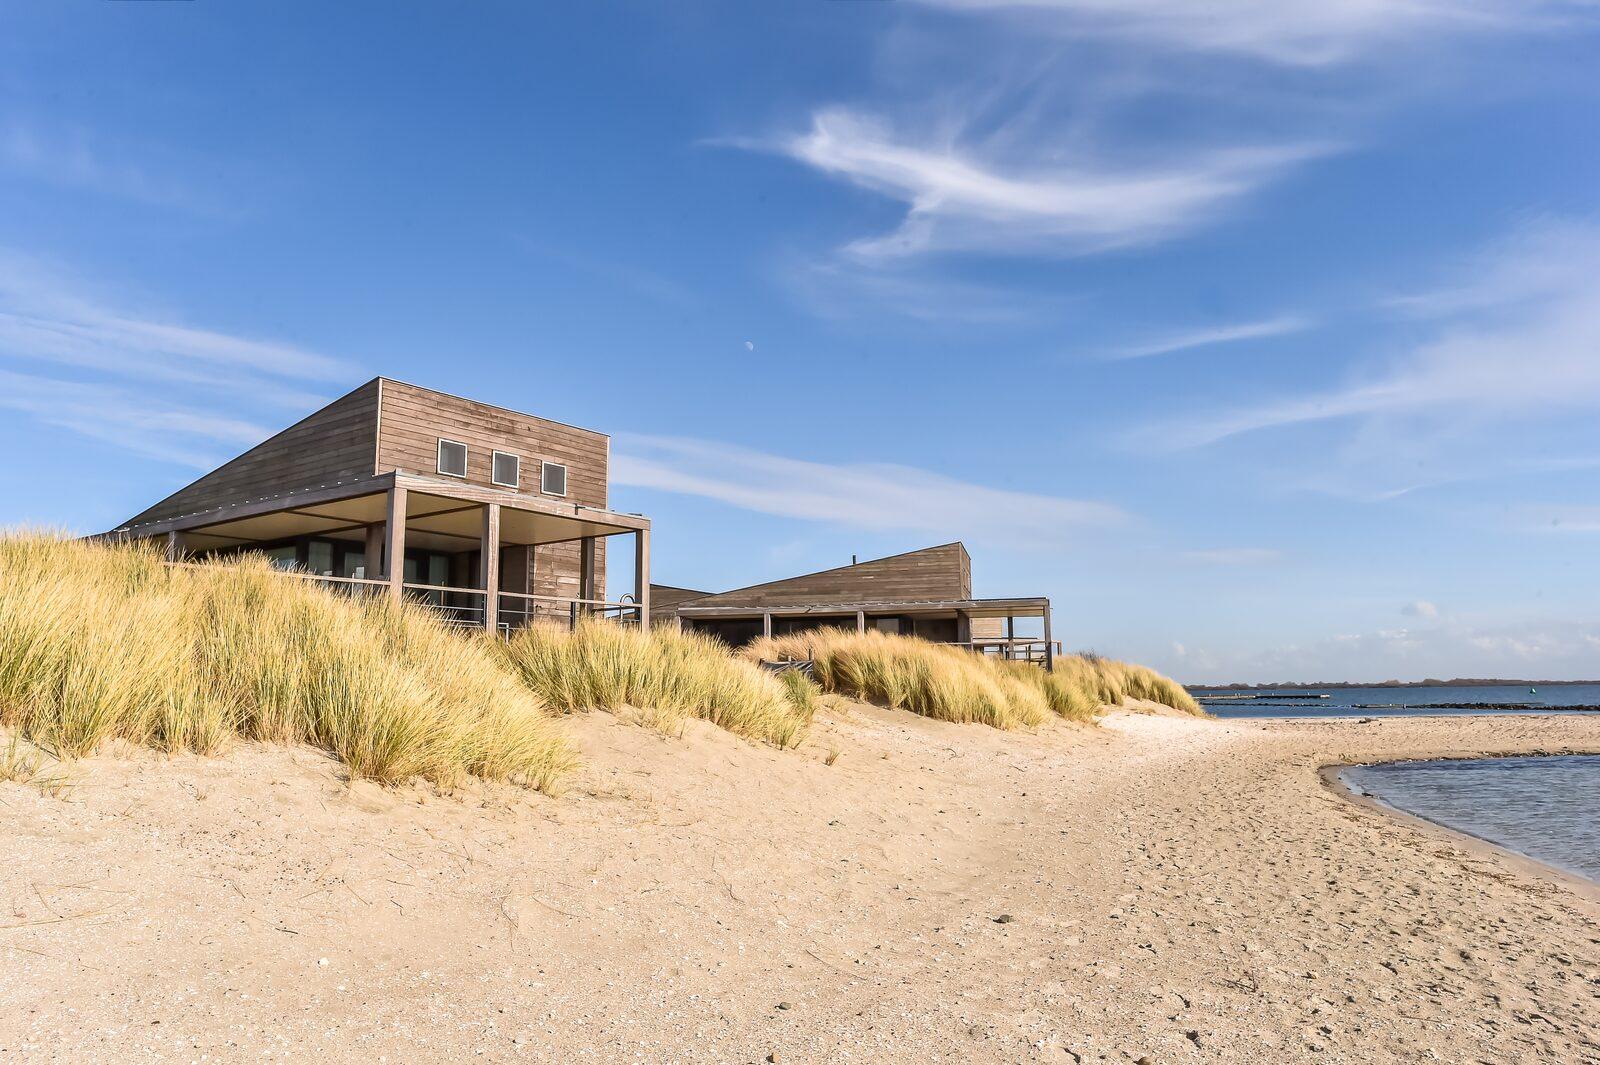 Strandpark bij Zeeland | Oasis Punt-West Hotel & Beach Resort